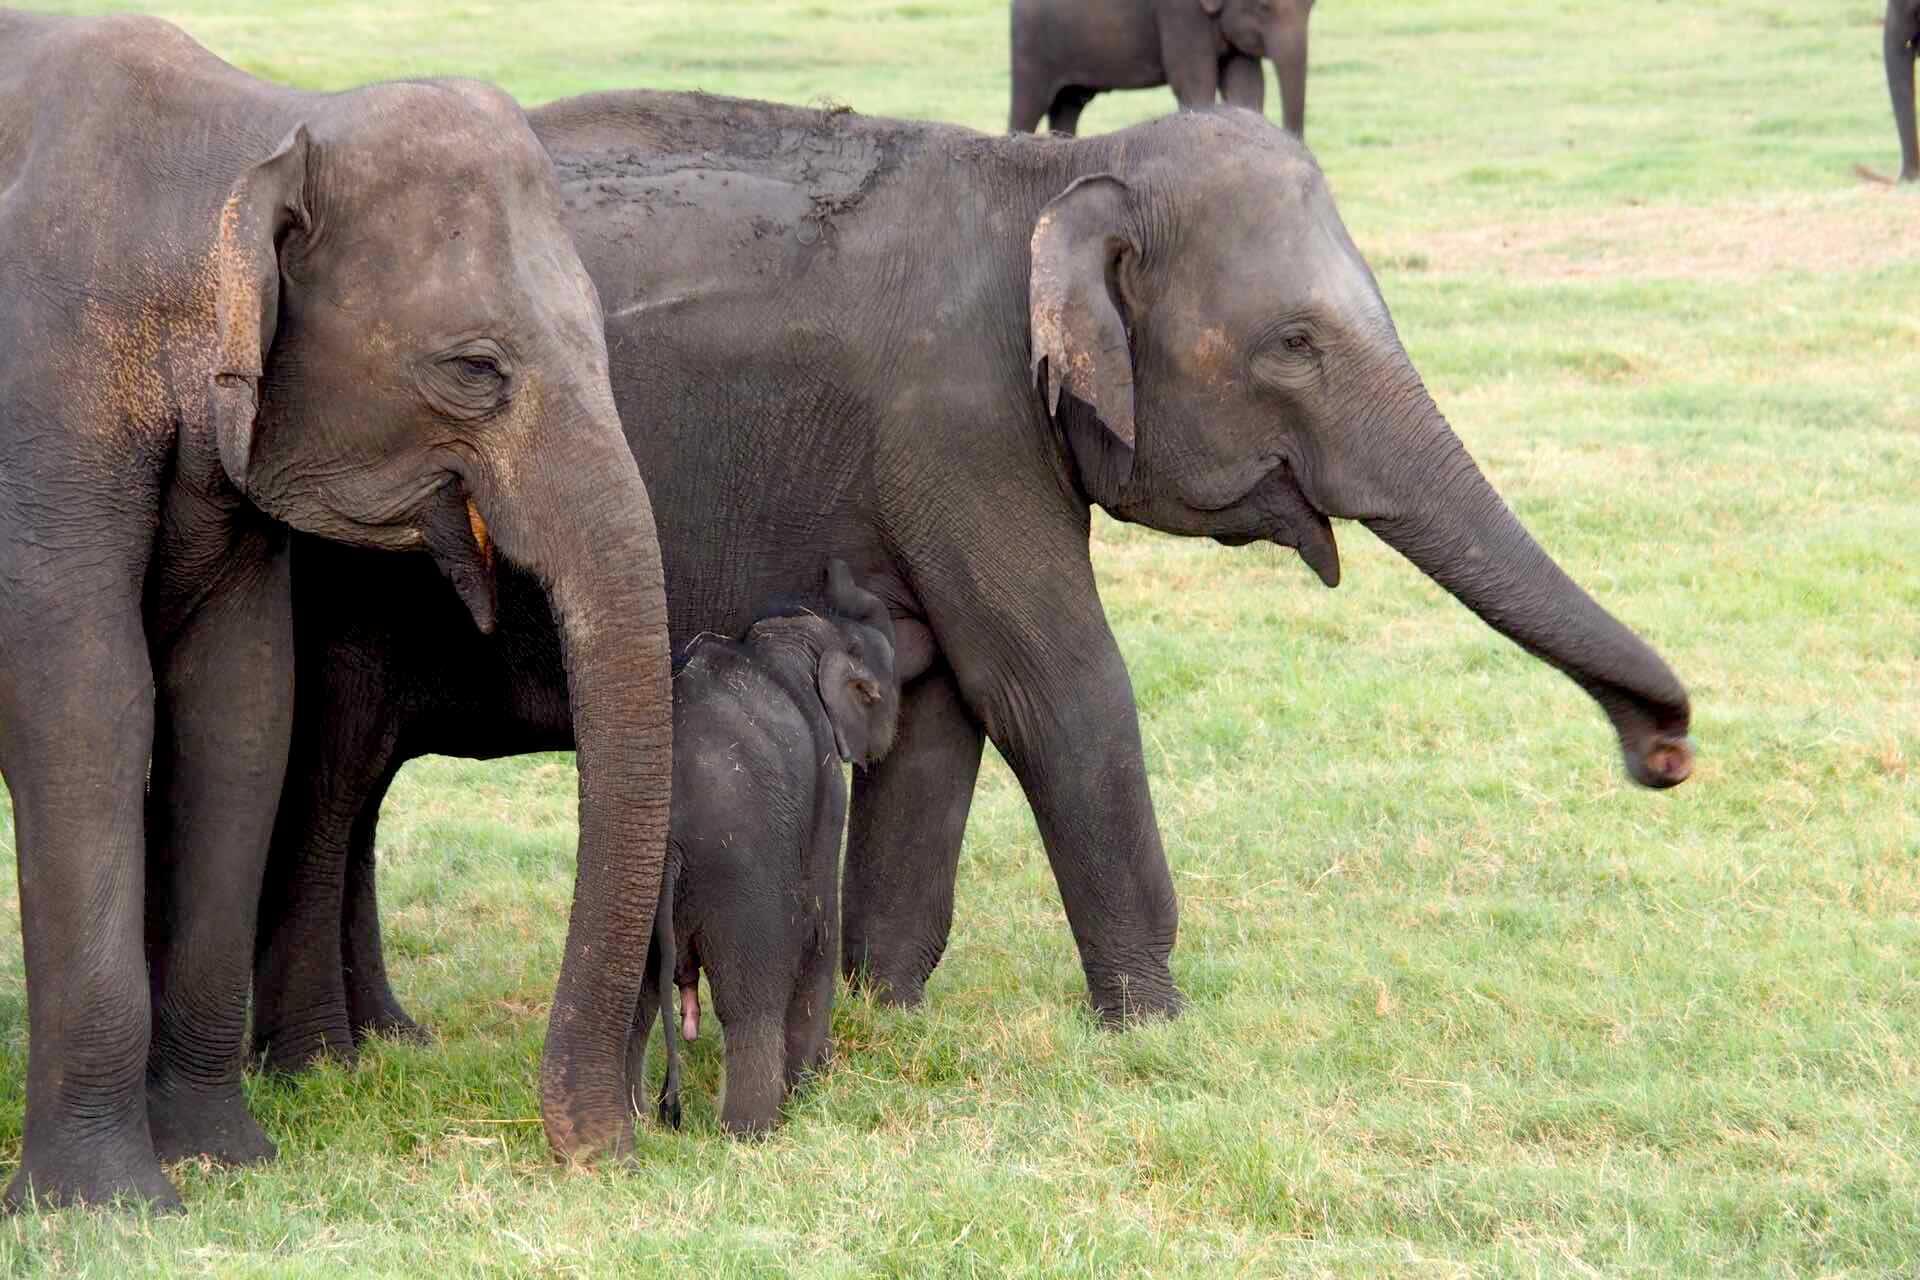 sri-lanka-elephant-wildlife-safari-baby-holiday-review-feedback-invite-to-paradise-quentin-kate-hulm.jpg